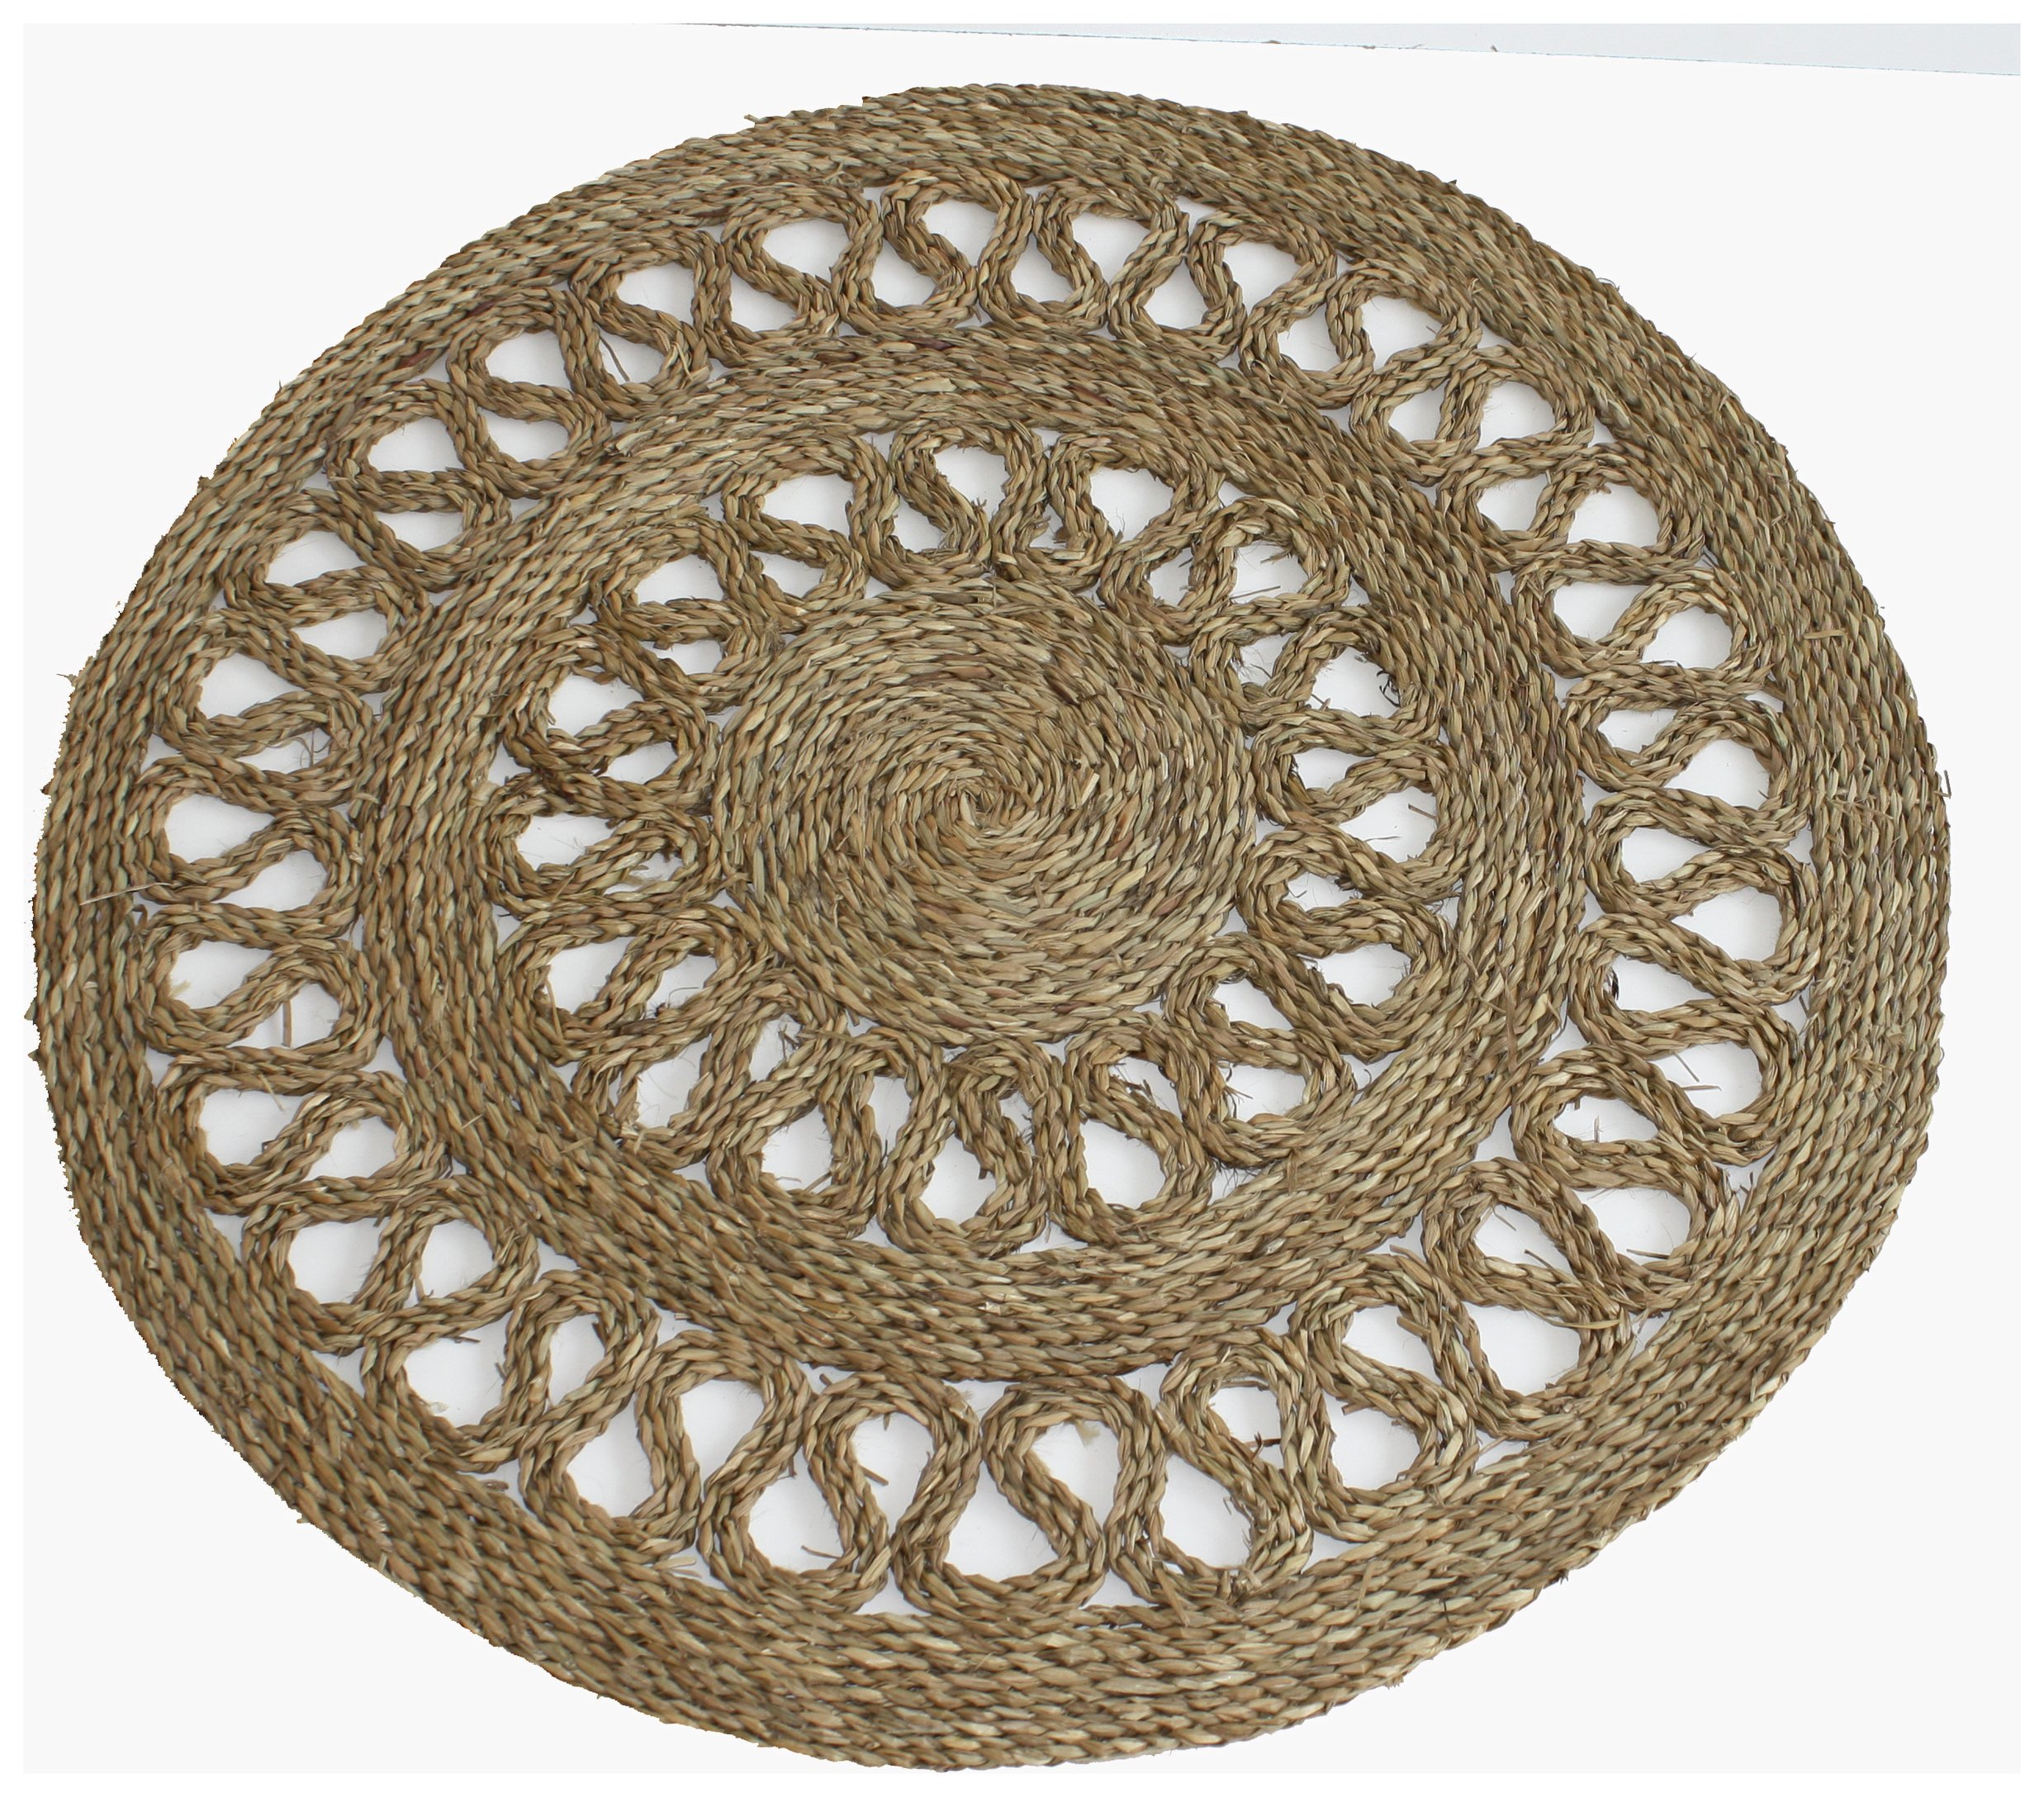 Seagrass Circular Rug: Seagrass Rugs